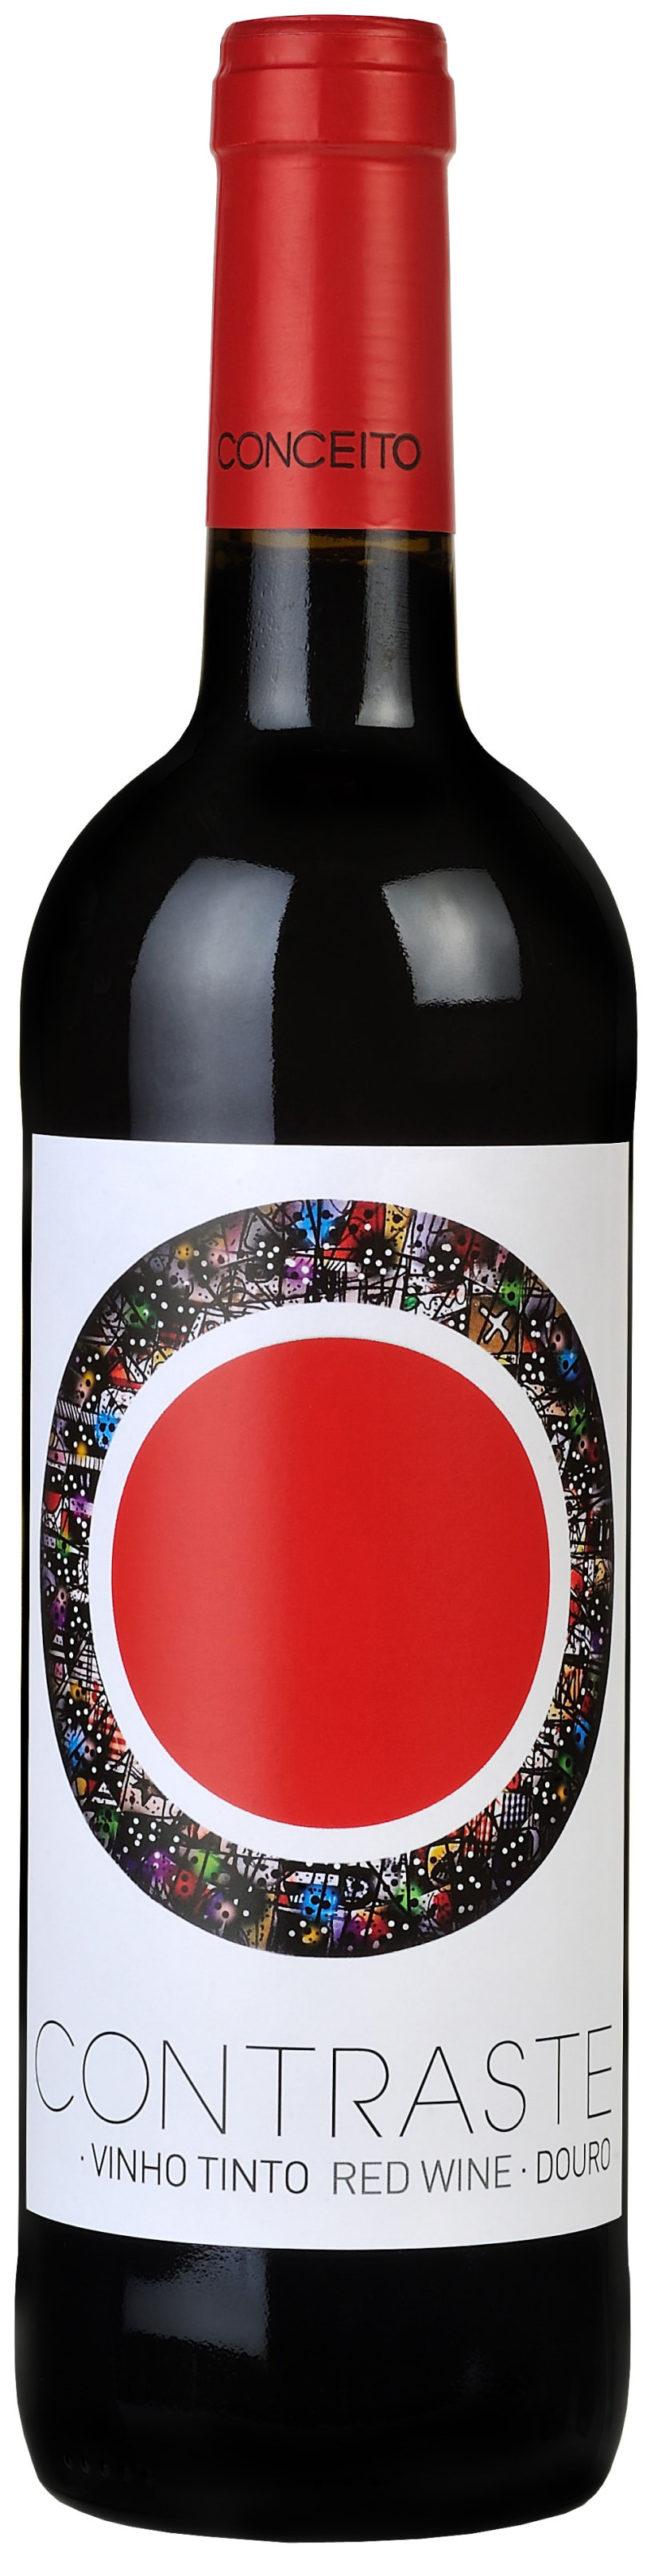 Conceito Contraste Tinto 2016 red wine